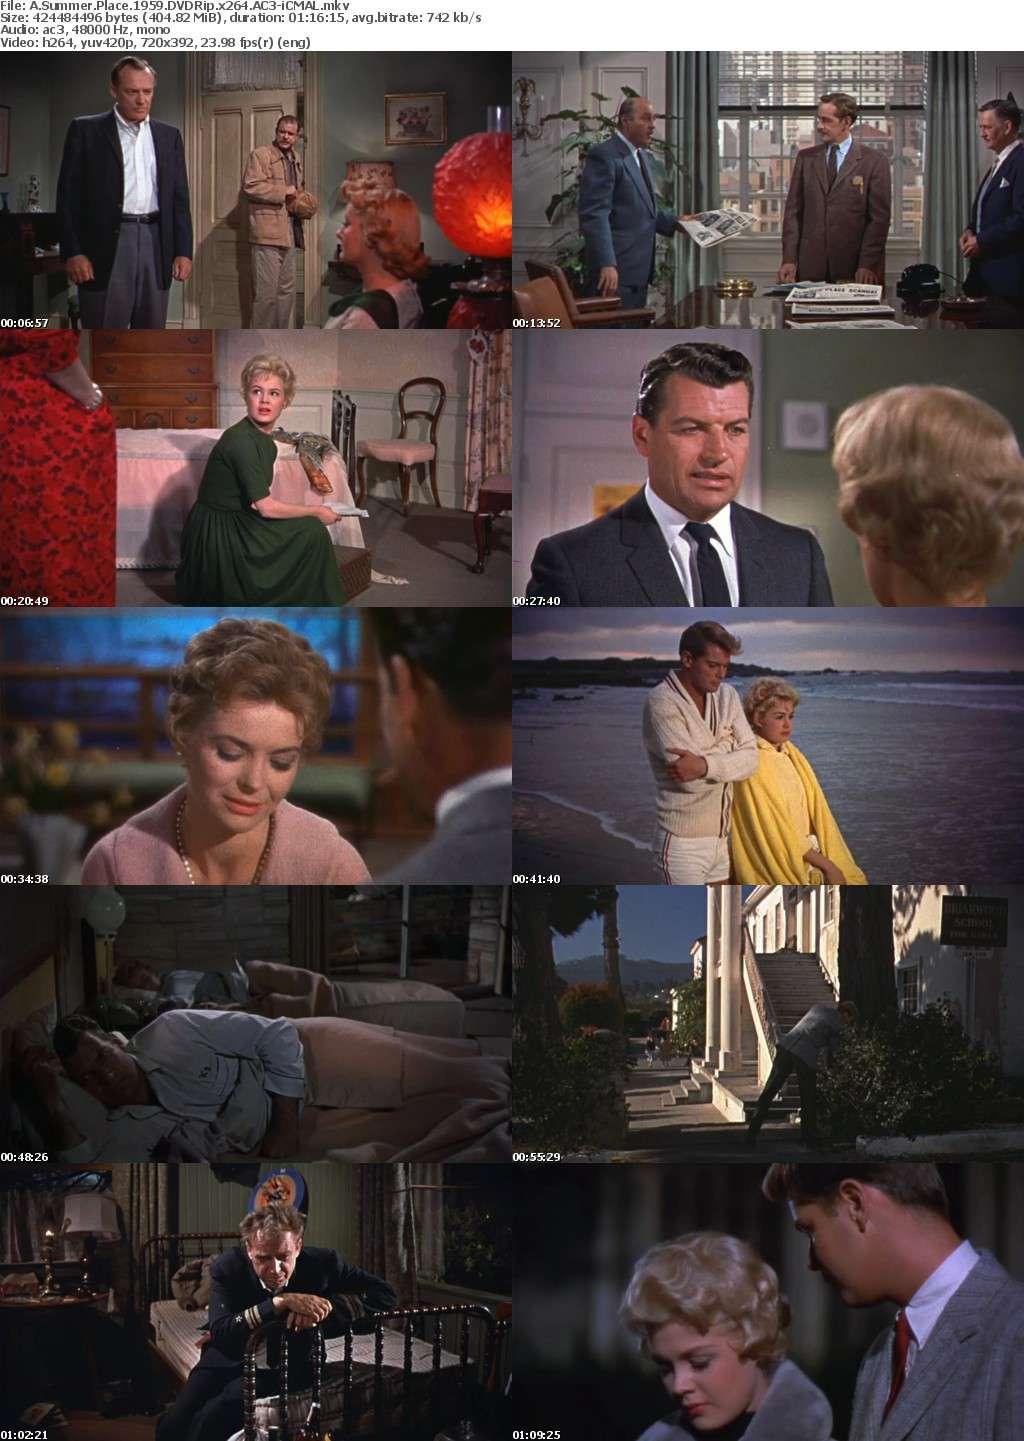 A Summer Place 1959 DVDRip x264 AC3-iCMAL